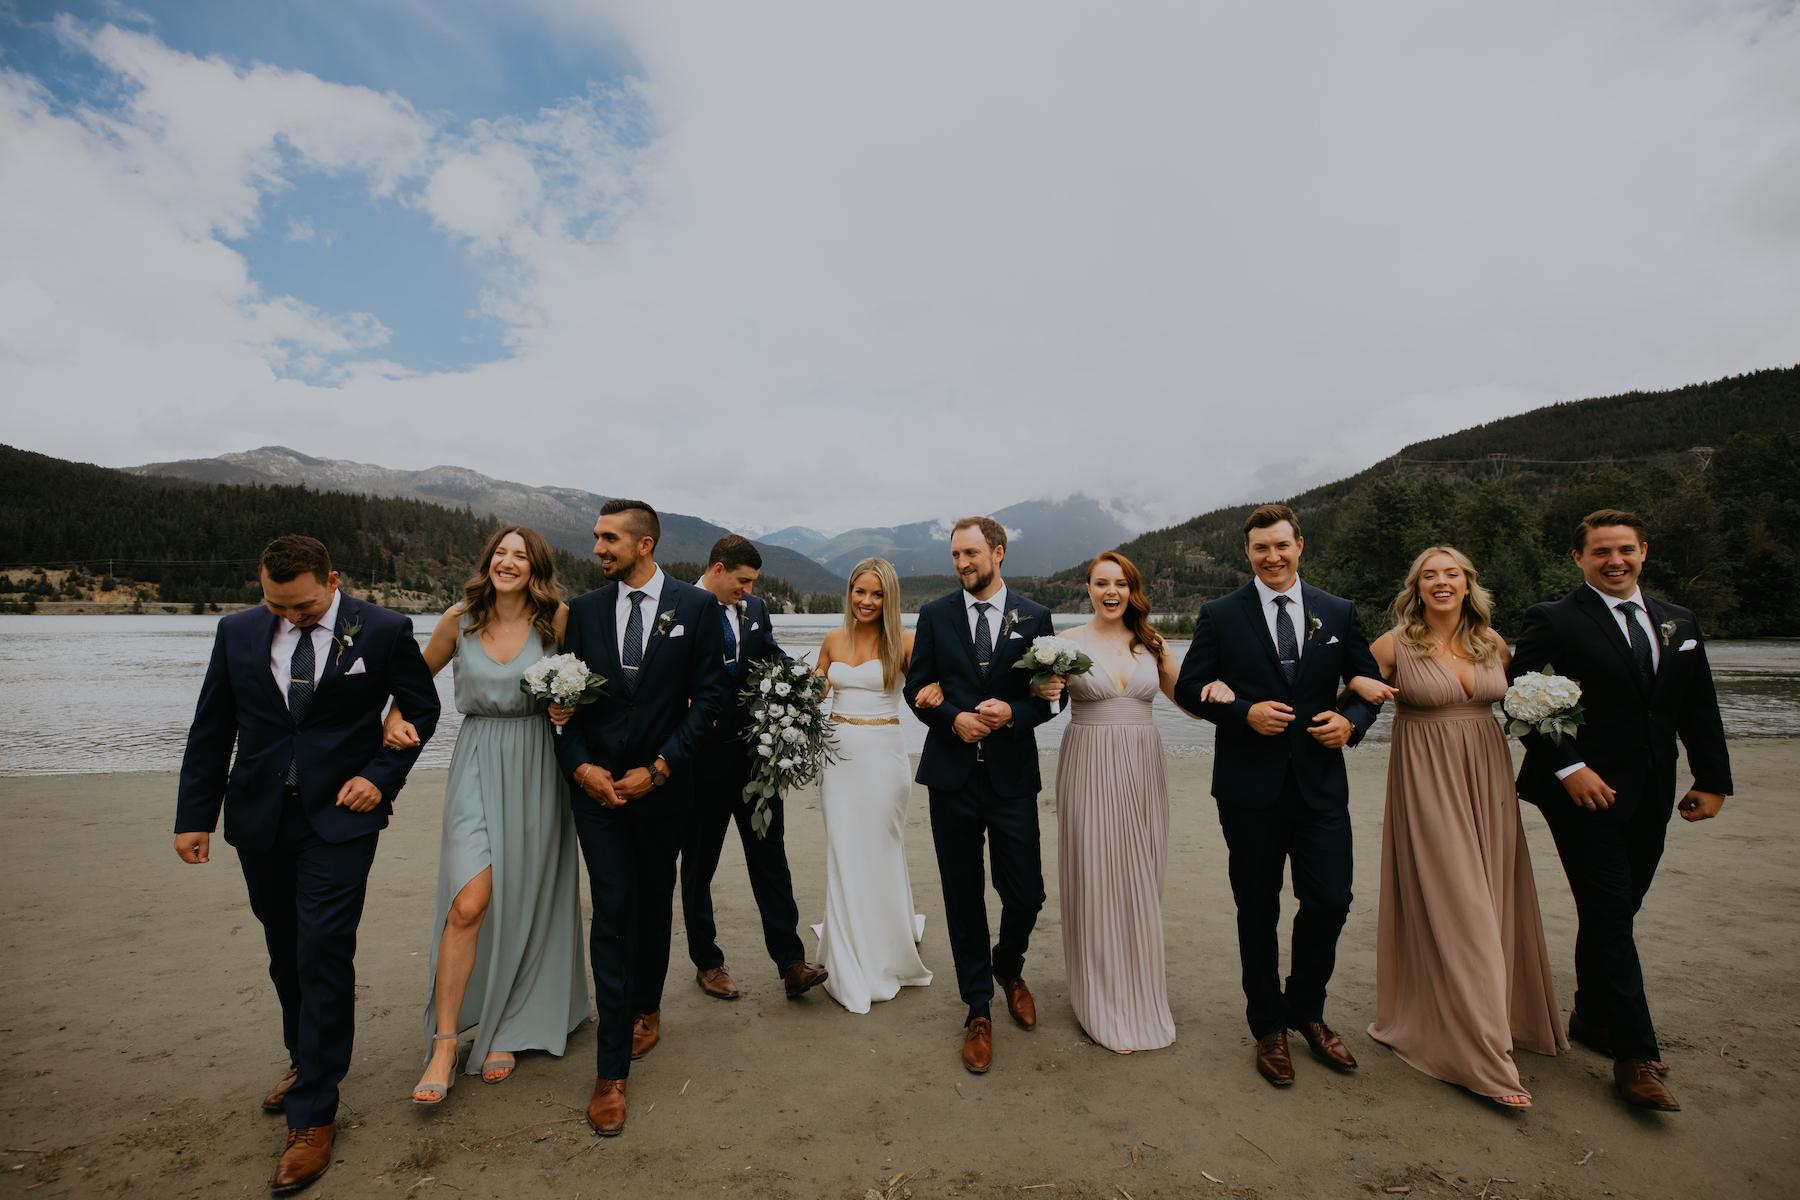 Riverlands-wedding-Pemberton-C+J-30.jpg